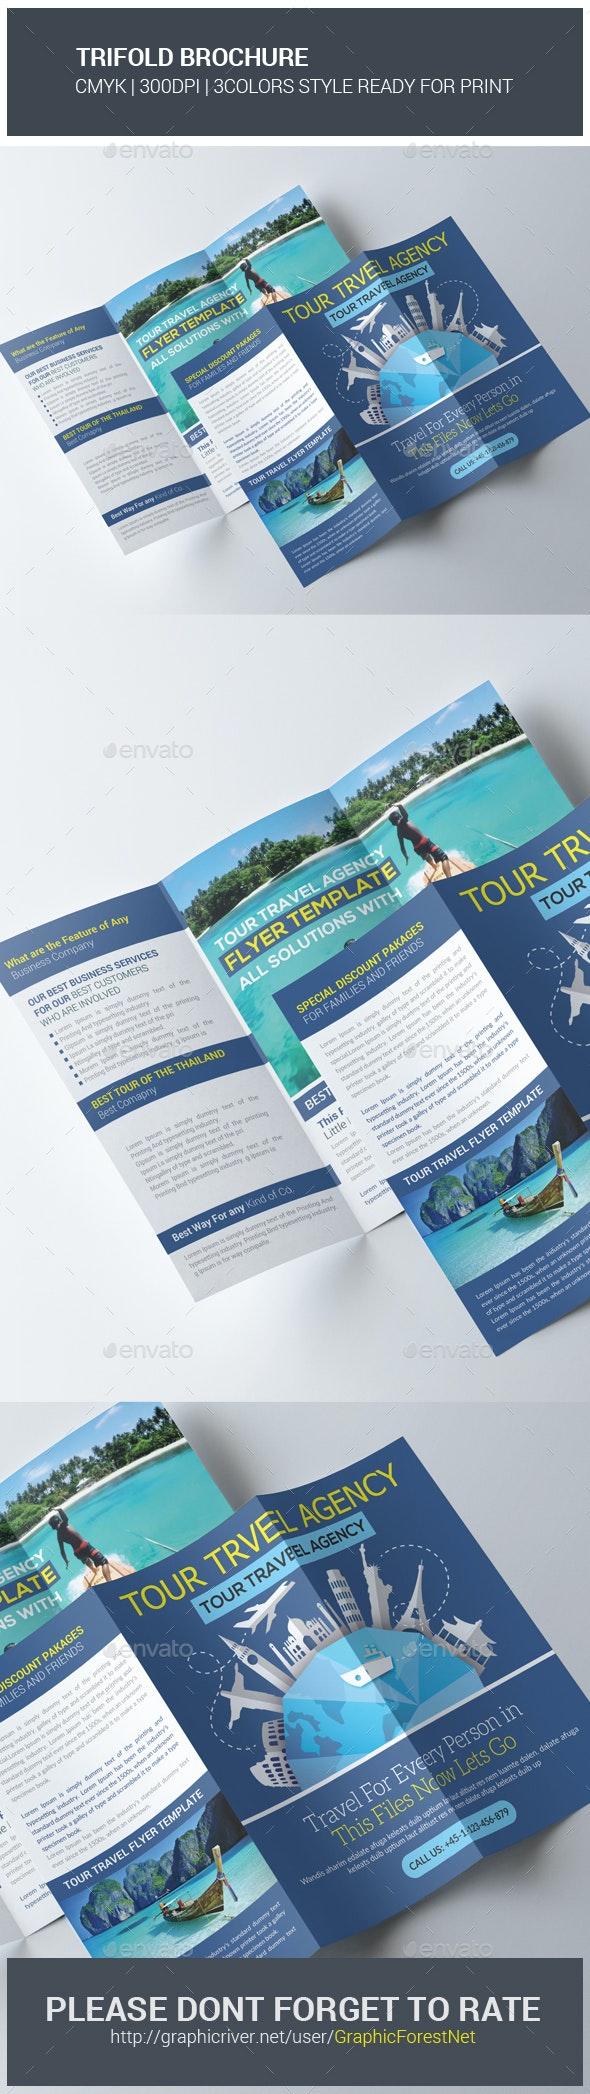 Thailand Tour Travel Trifold Brochure - Brochures Print Templates